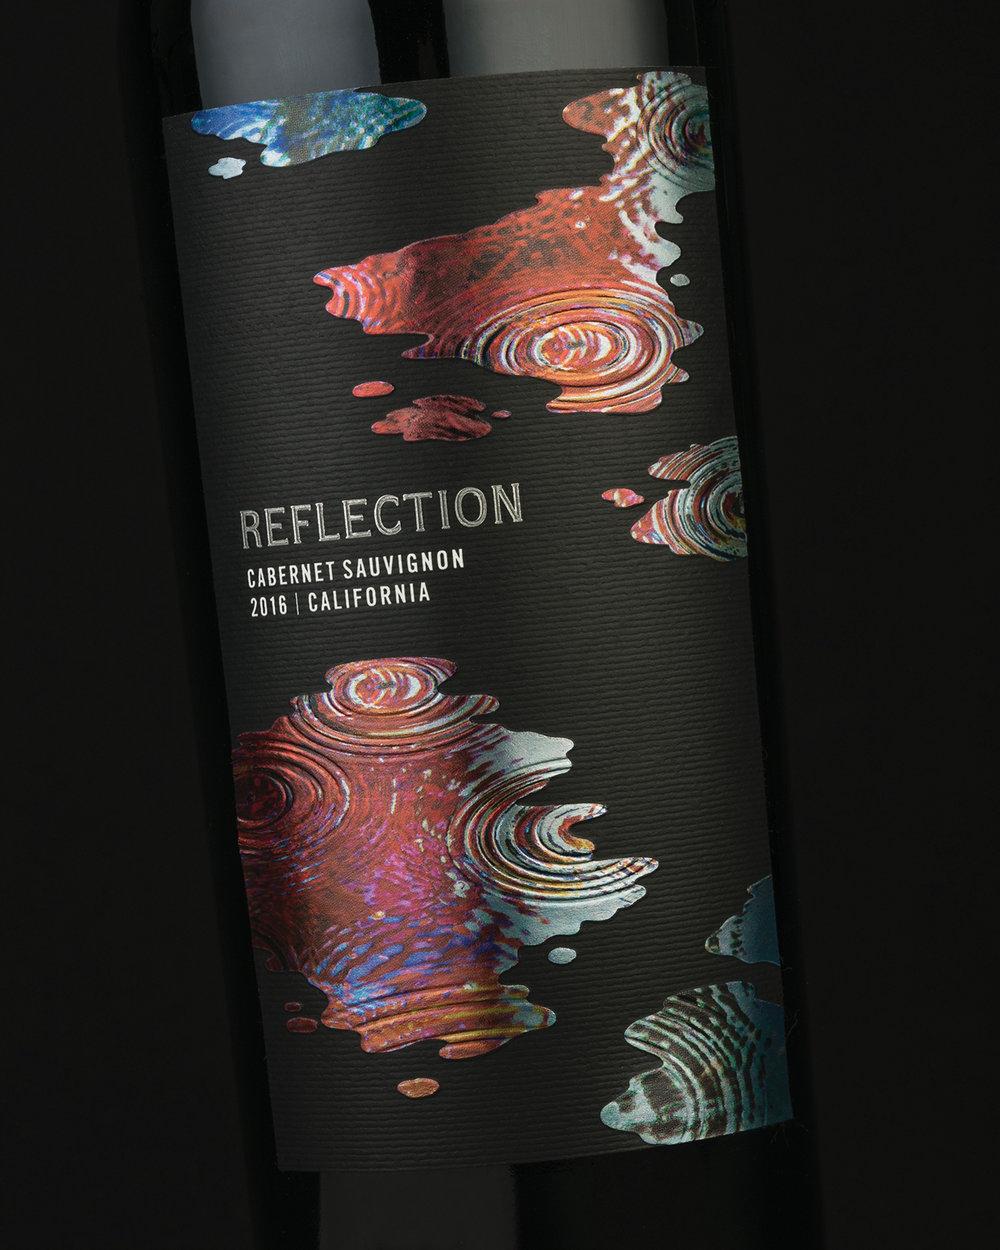 reflection_wine_black_closeup_sterling_creativeworks.jpg